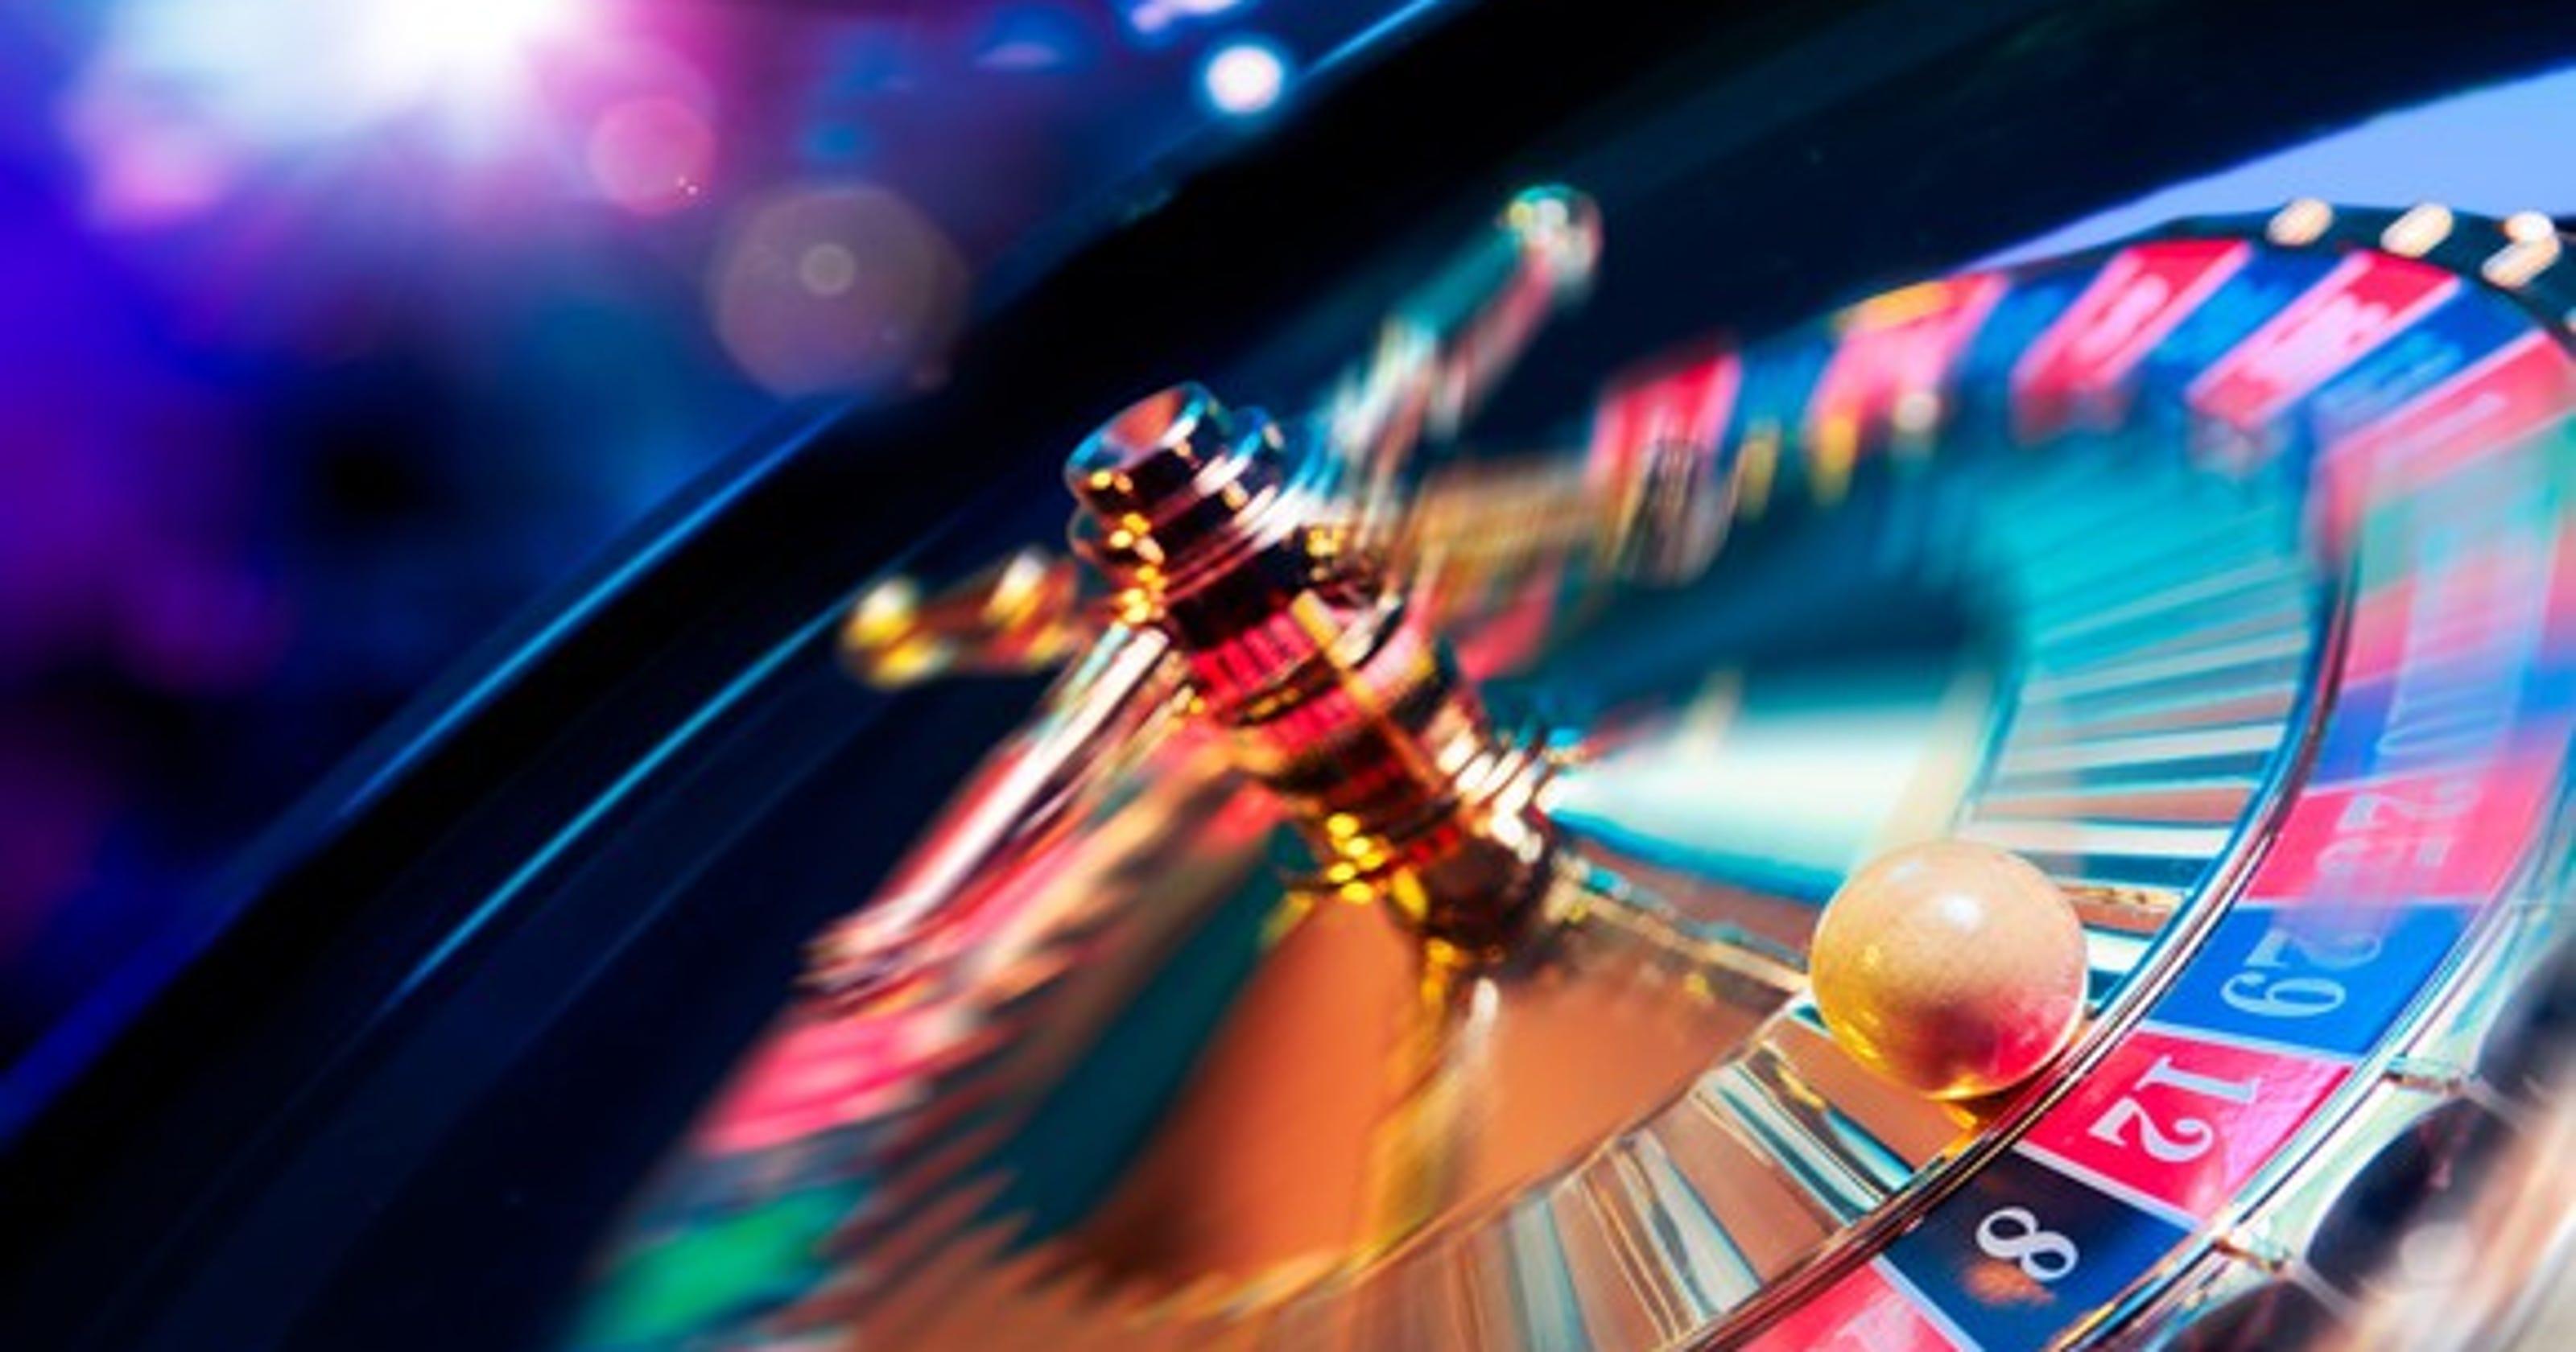 Legalising gambling can help generate jobs, revenue